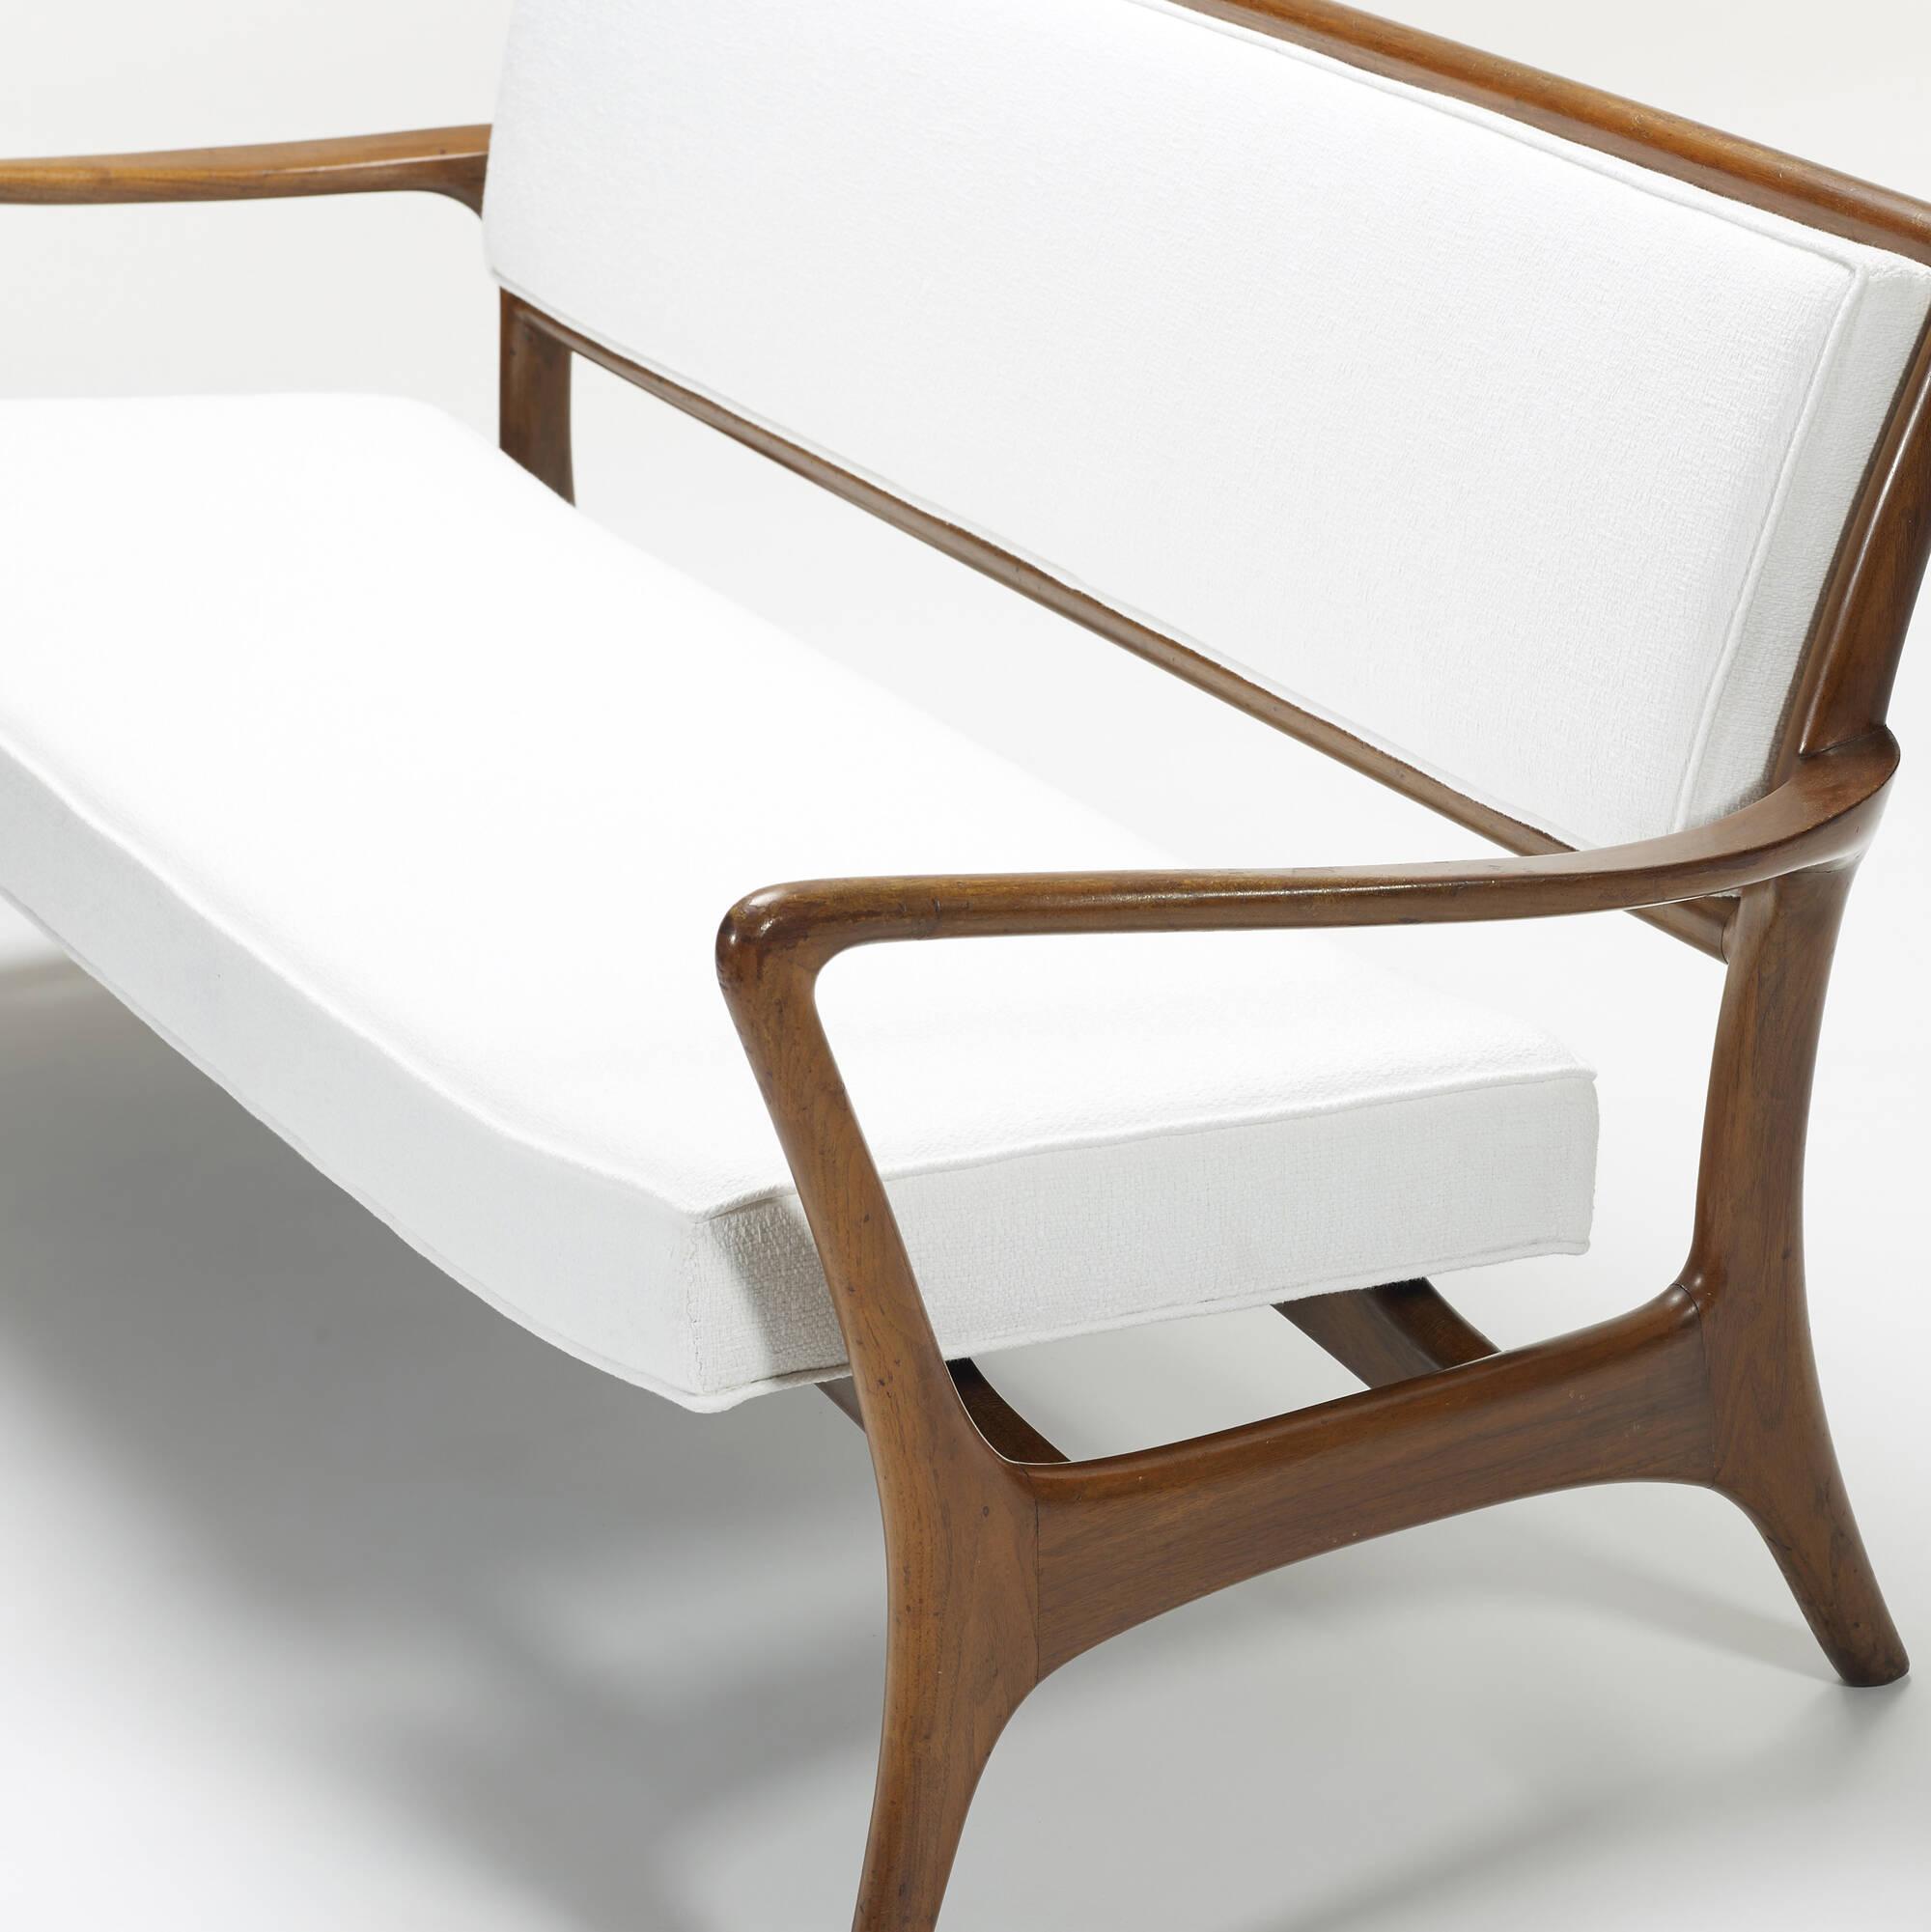 303 Vladimir Kagan sofa Design 11 June 2015 Auctions